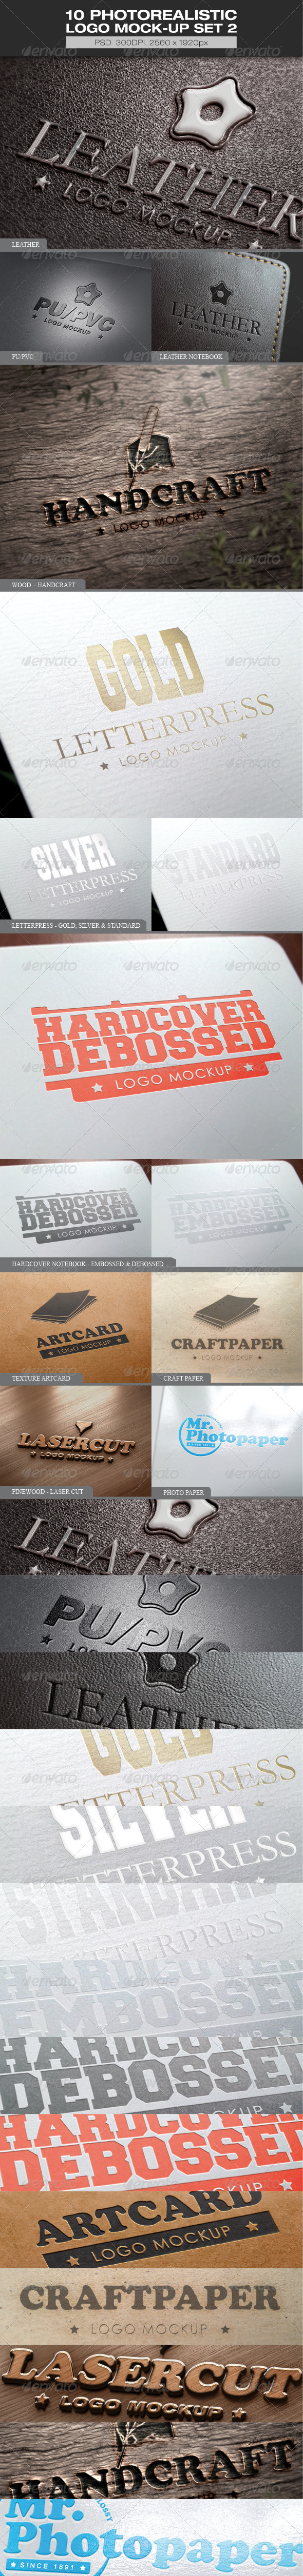 GraphicRiver 10 Photorealistic Logo Mock-up Set 2 5889432